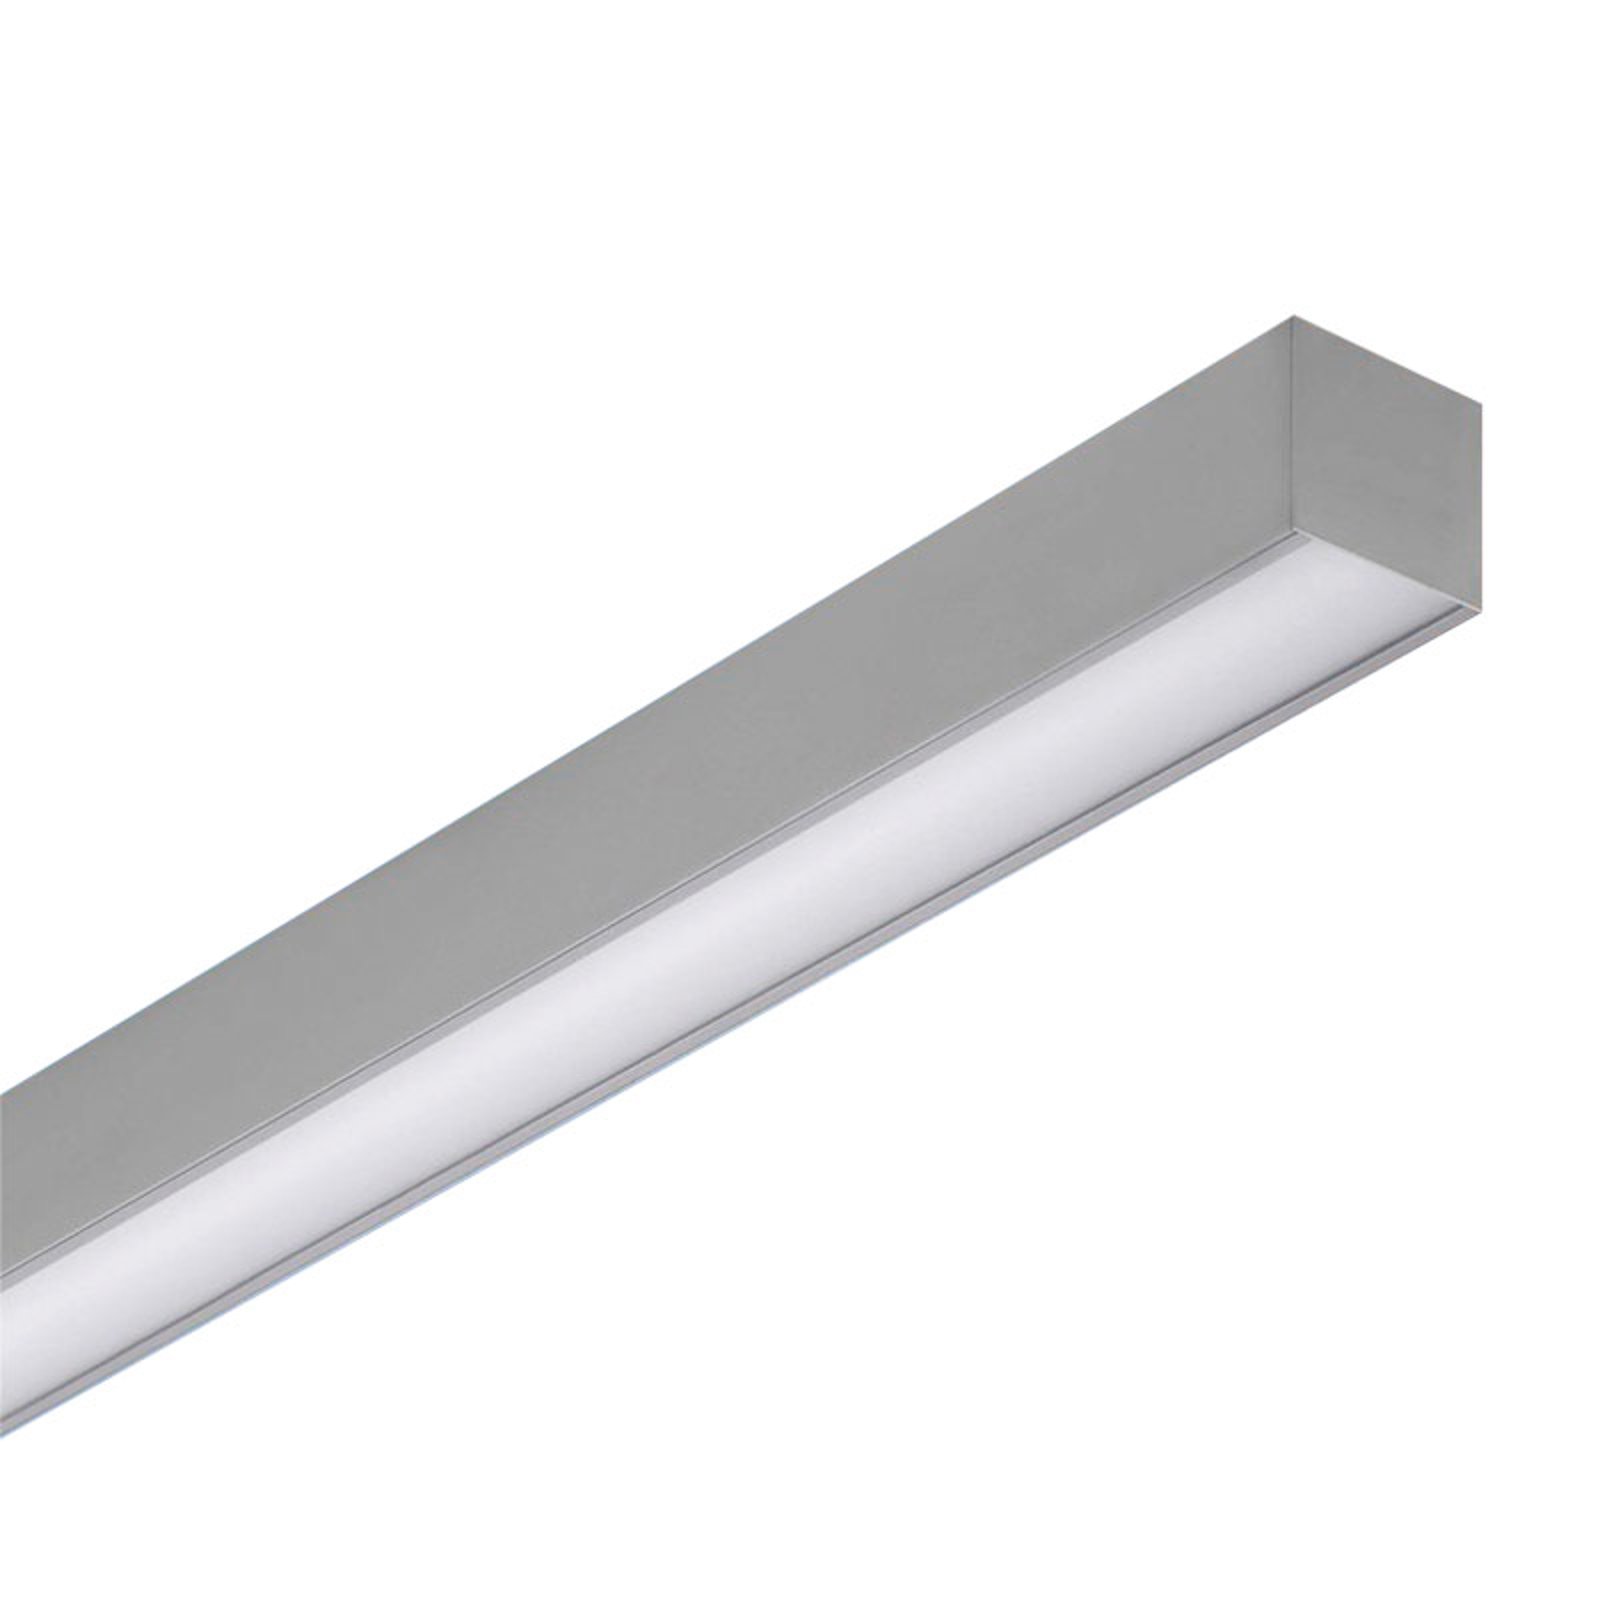 LKPW075 LED-Wandleuchte, 3.000K titansilber